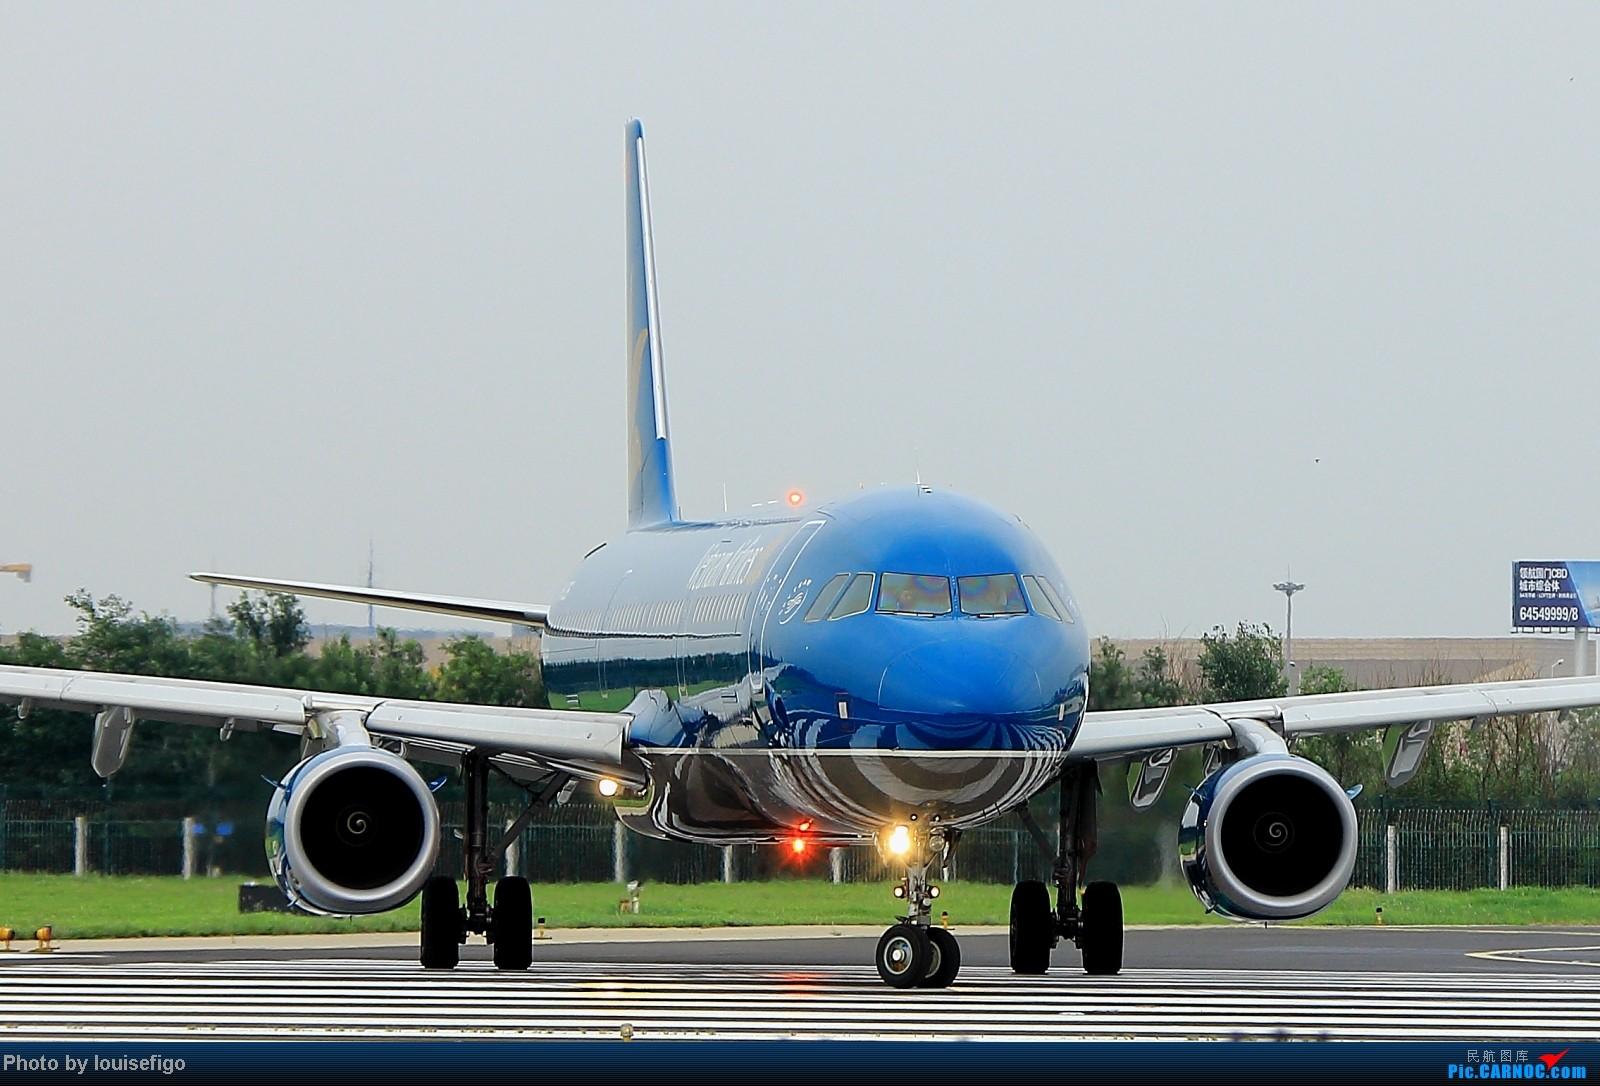 Re:[原创]闲来无事天气闷,发点冷饭自娱乐!!!PEK西跑的降落杂图~发到哪儿是哪儿啊!随心情! AIRBUS A321-200 VN-A326 北京首都国际机场